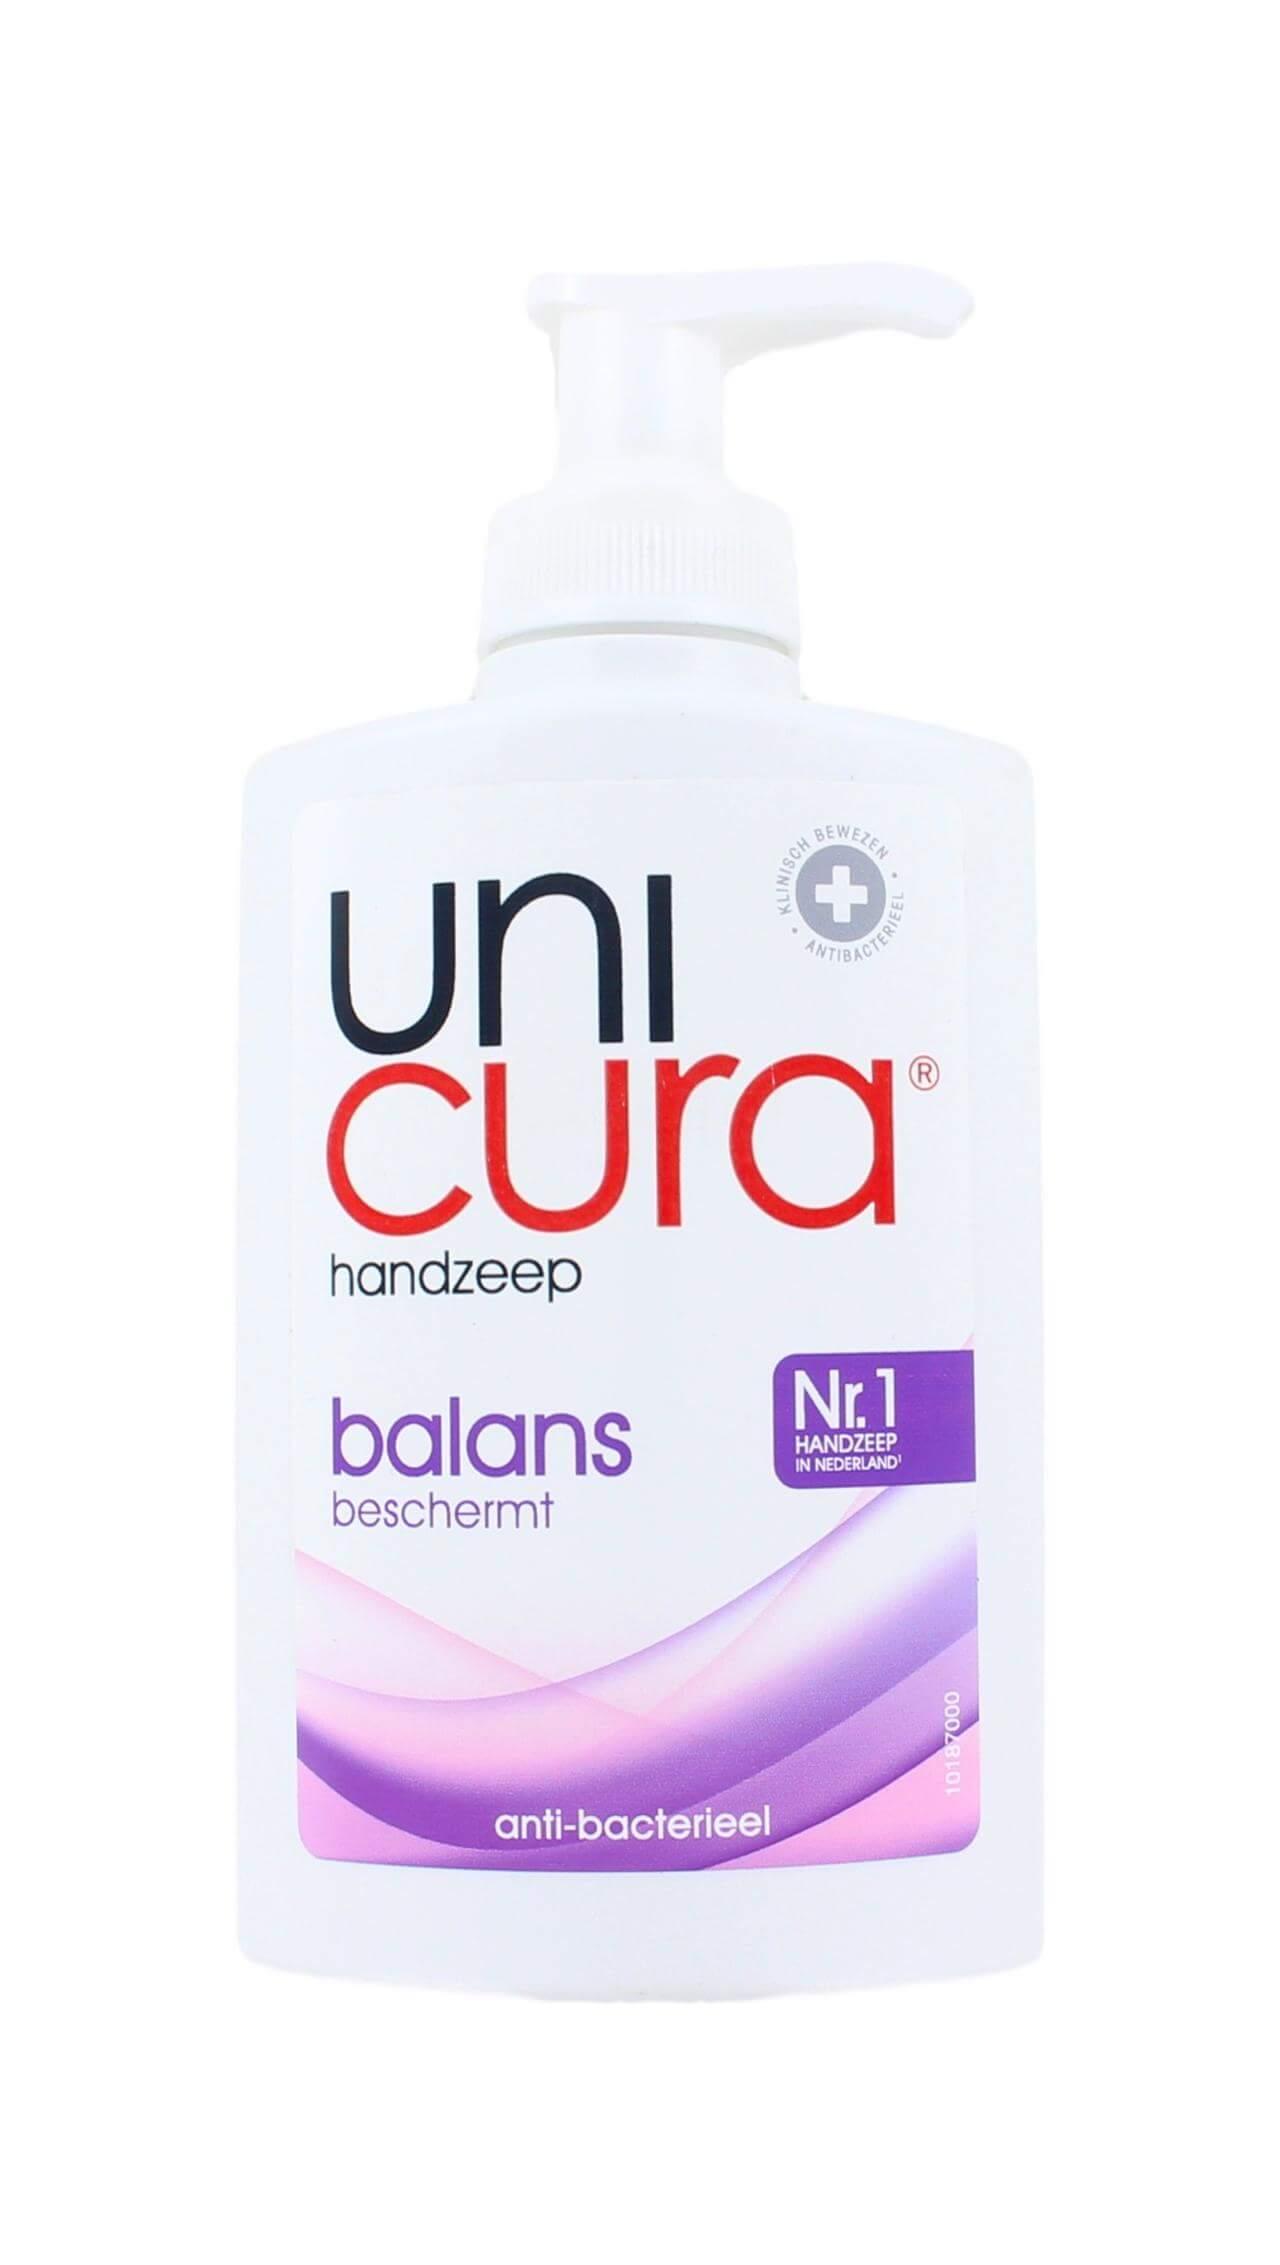 Unicura Handzeep Balans, 250 ml